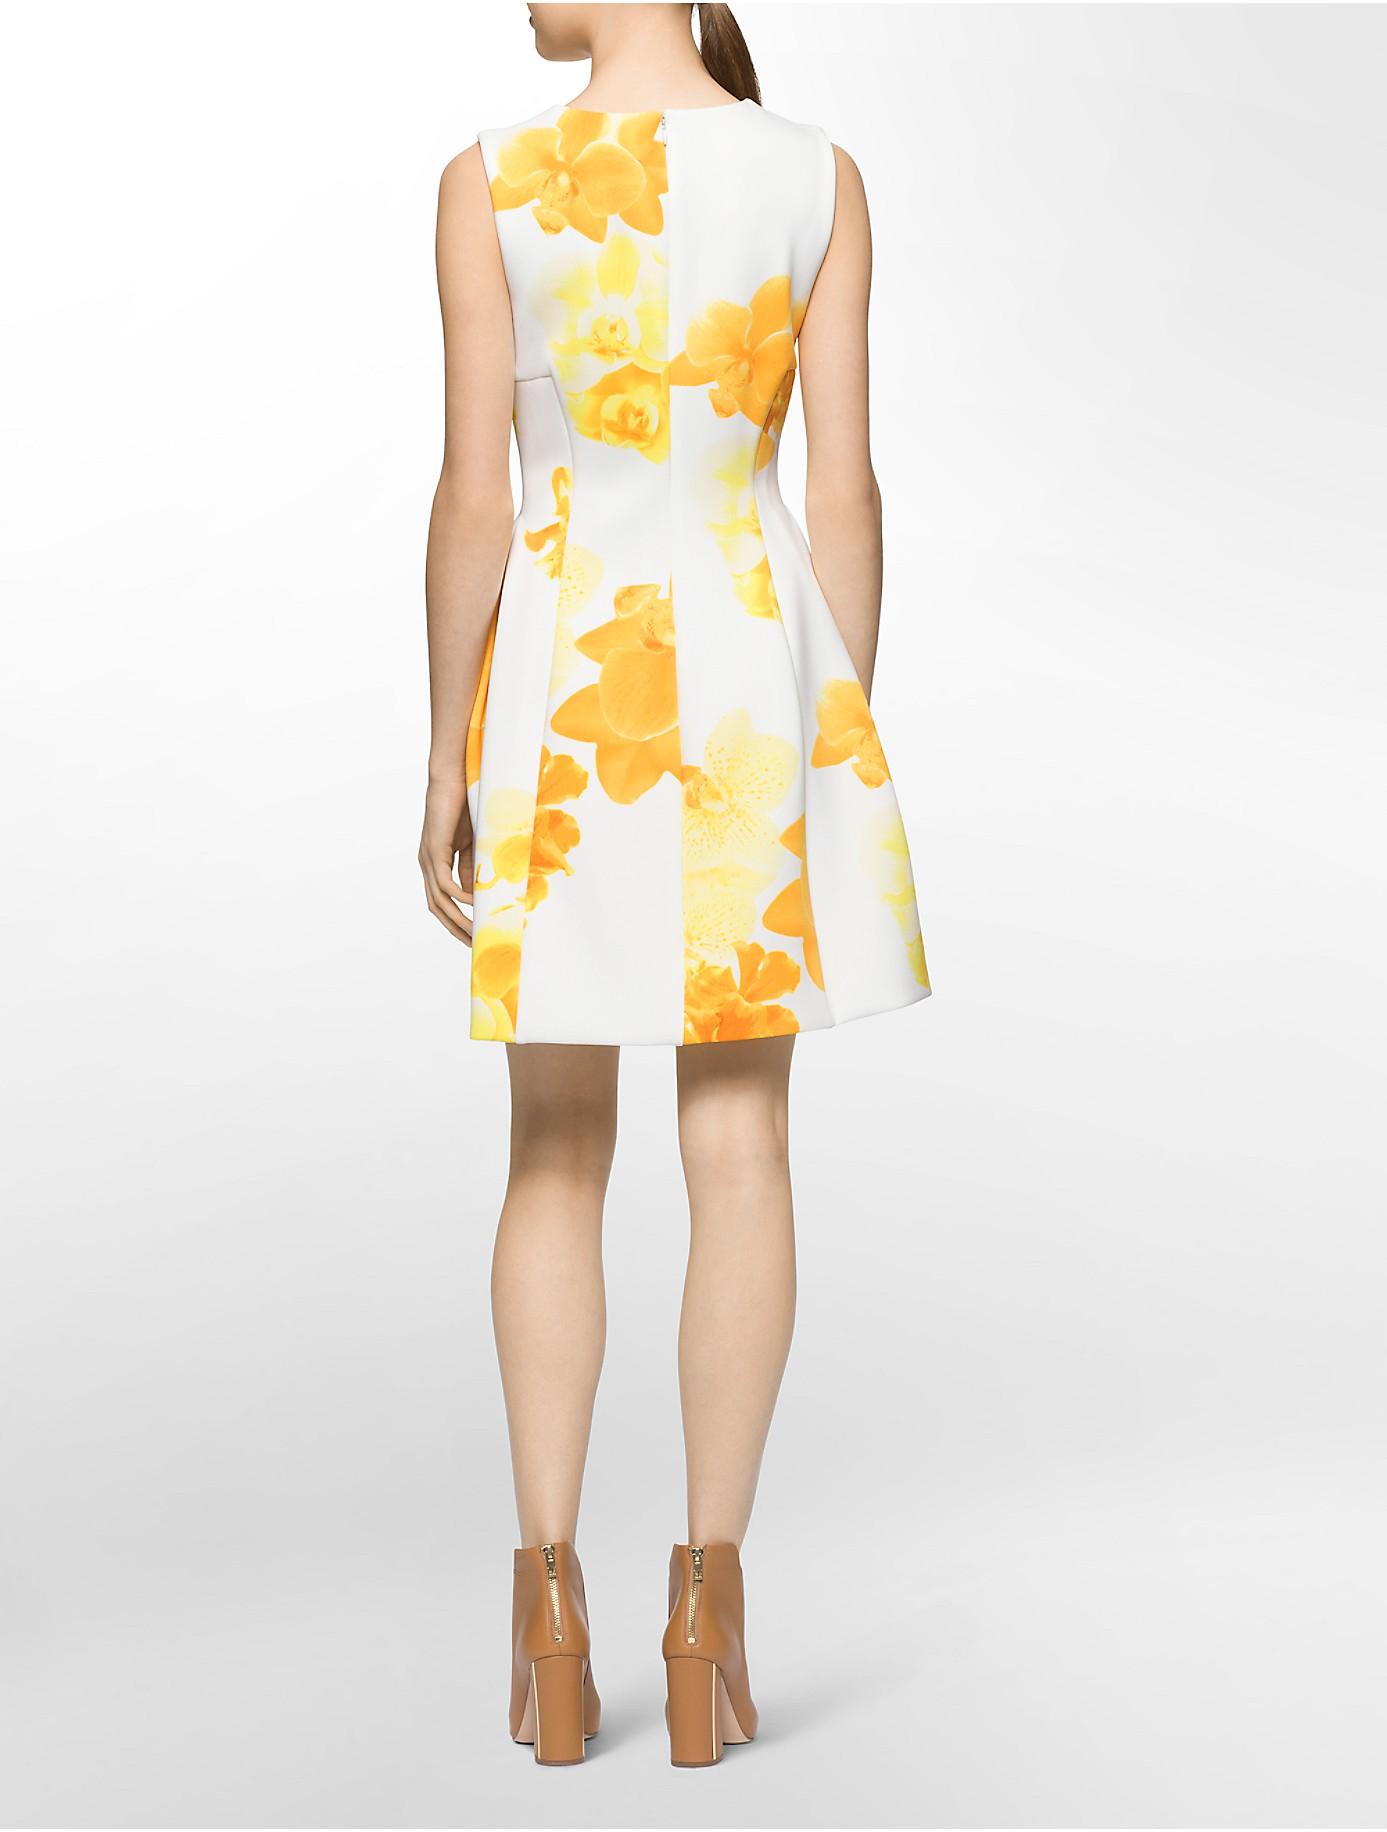 Calvin Klein White Label Sleeveless Floral Print Fit